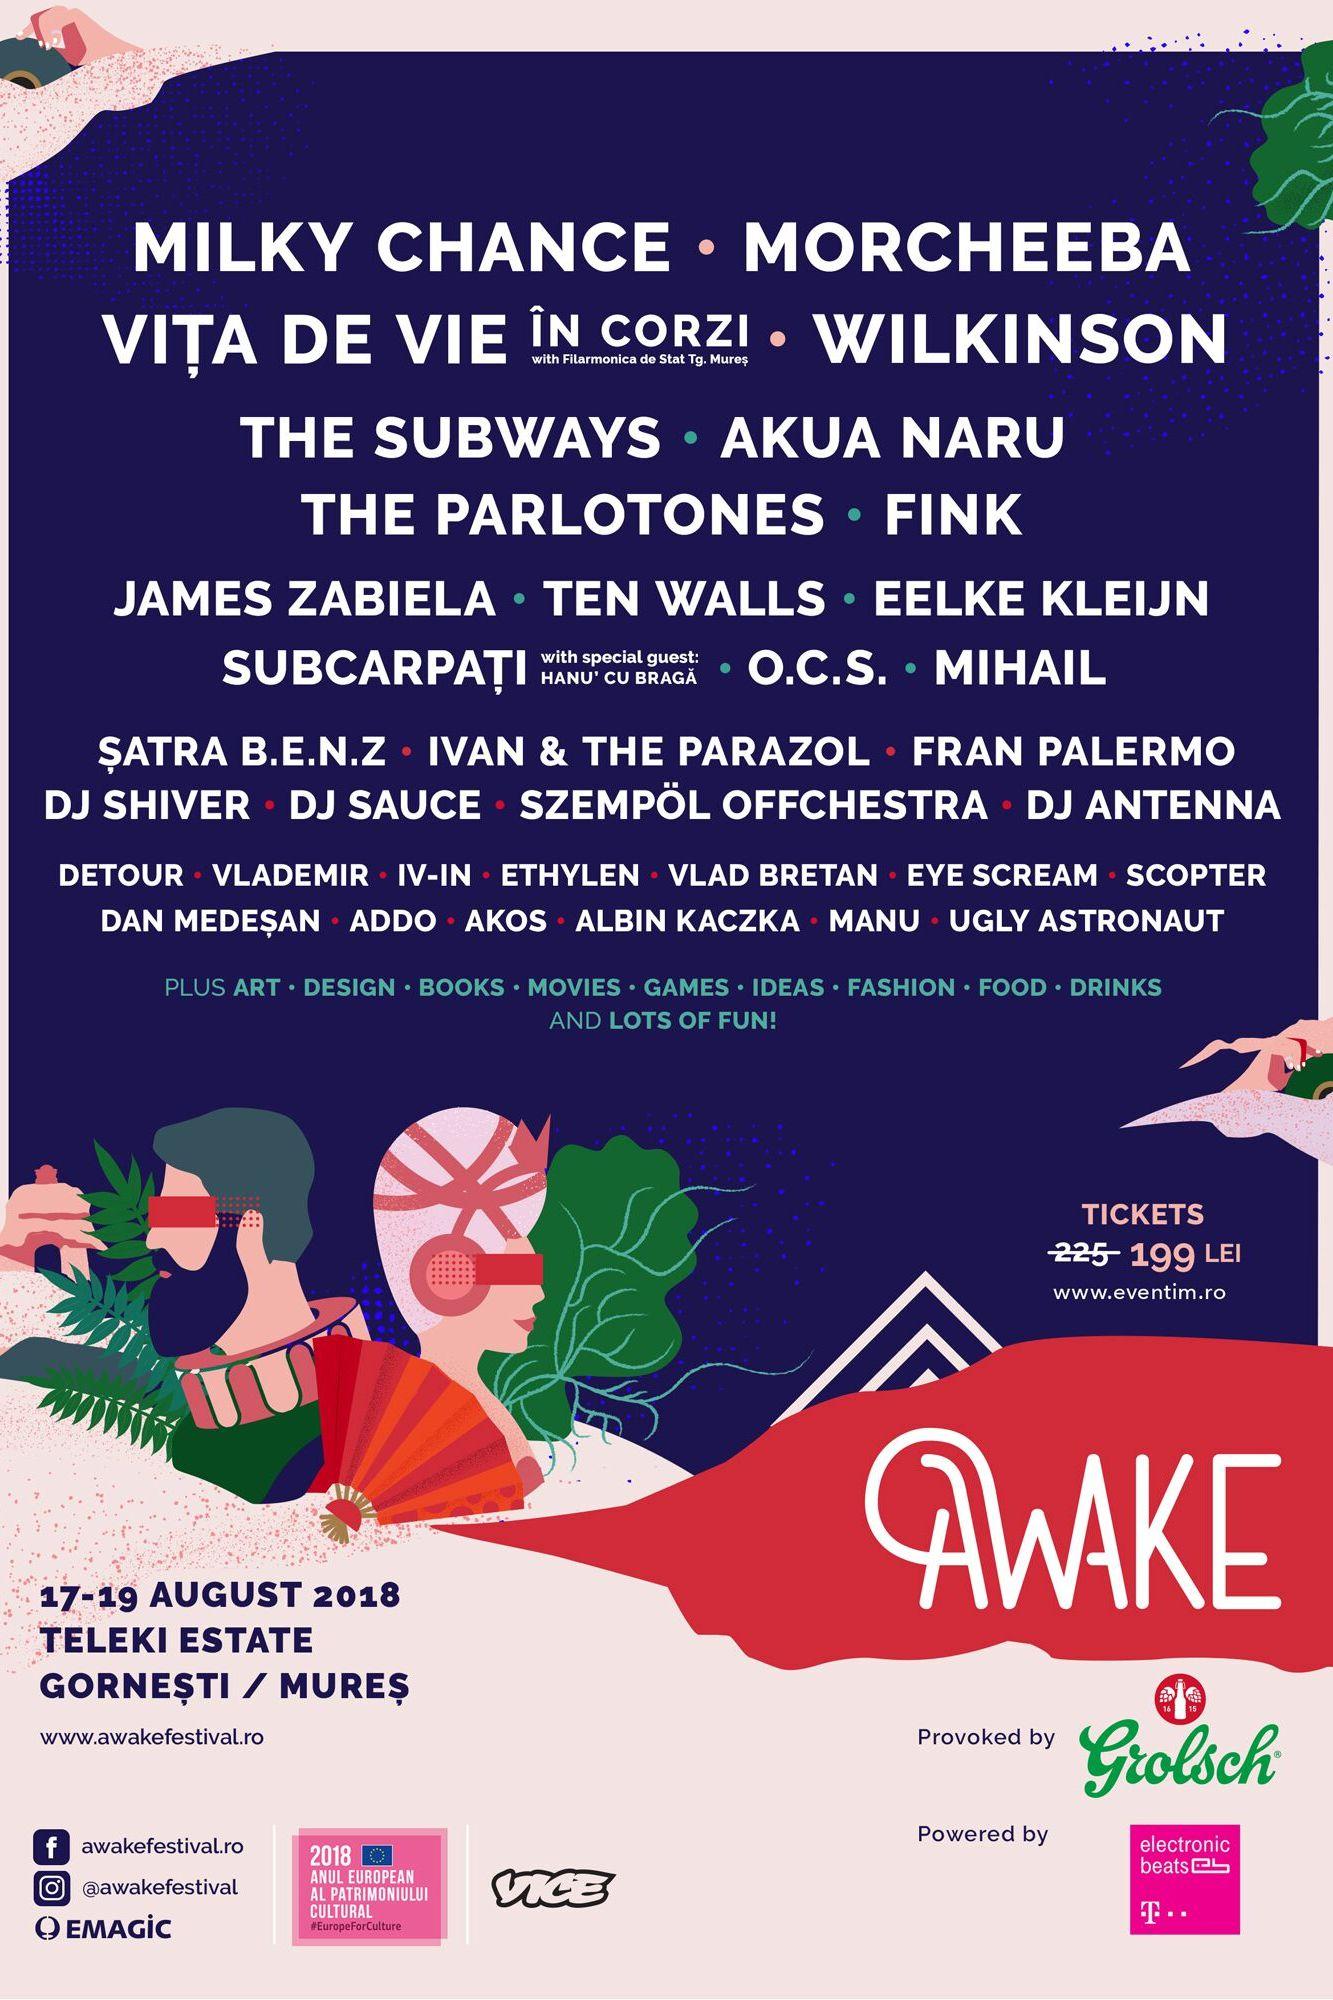 AWAKE Festival 2018 la Domeniul Teleki